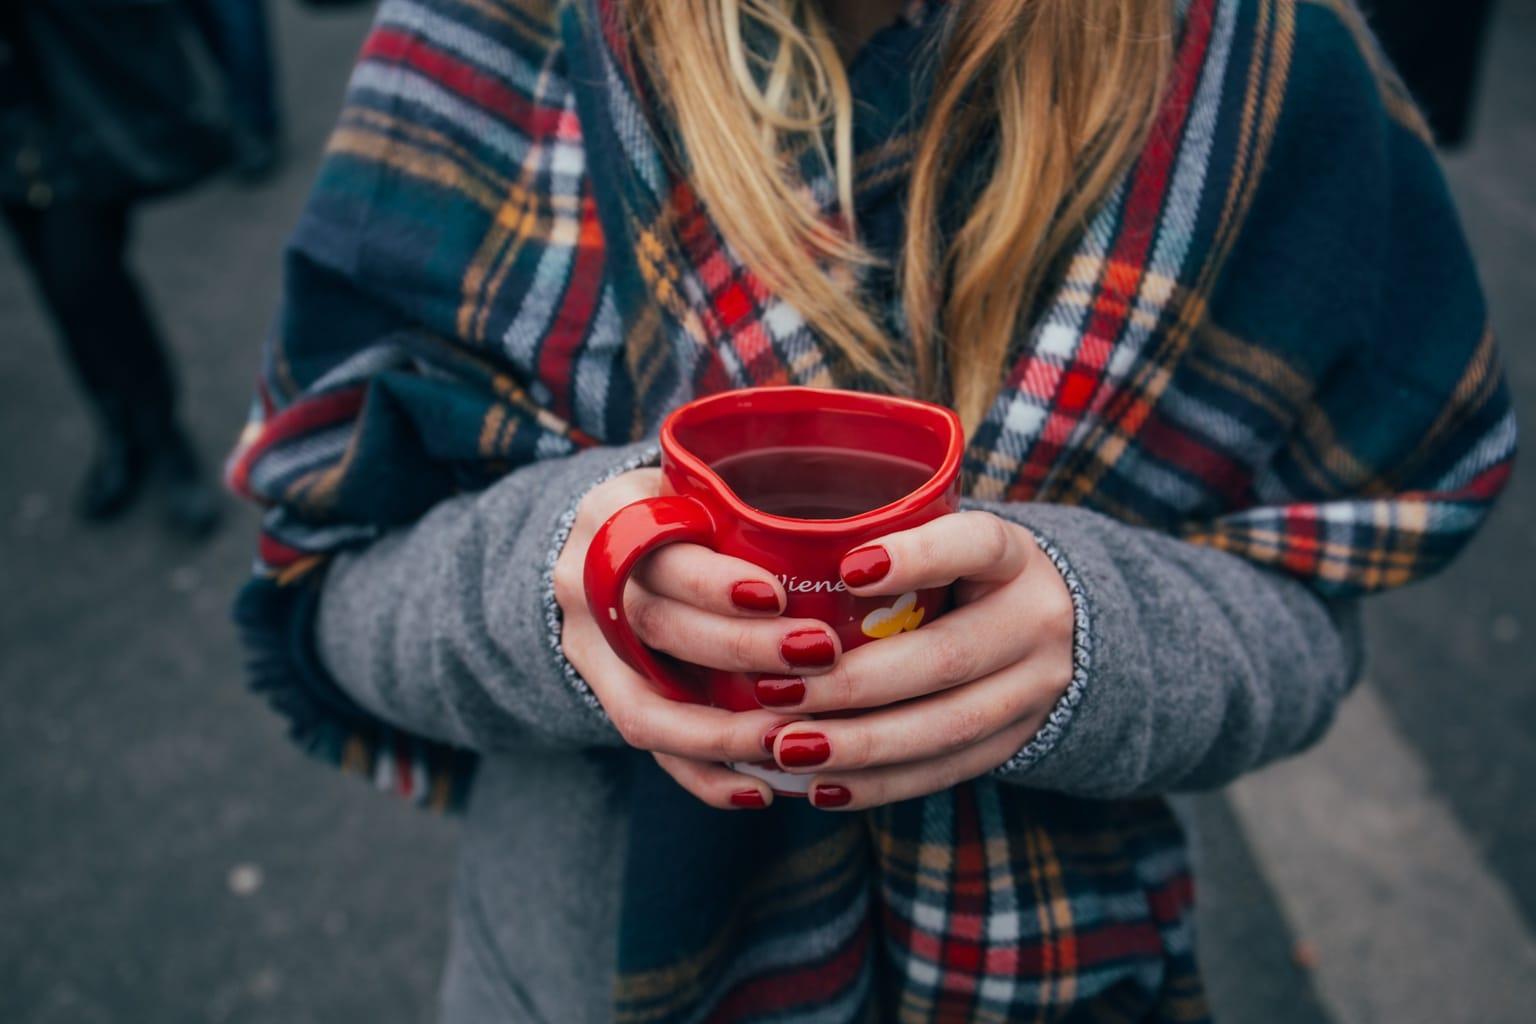 Girl holding a red mug of coffee